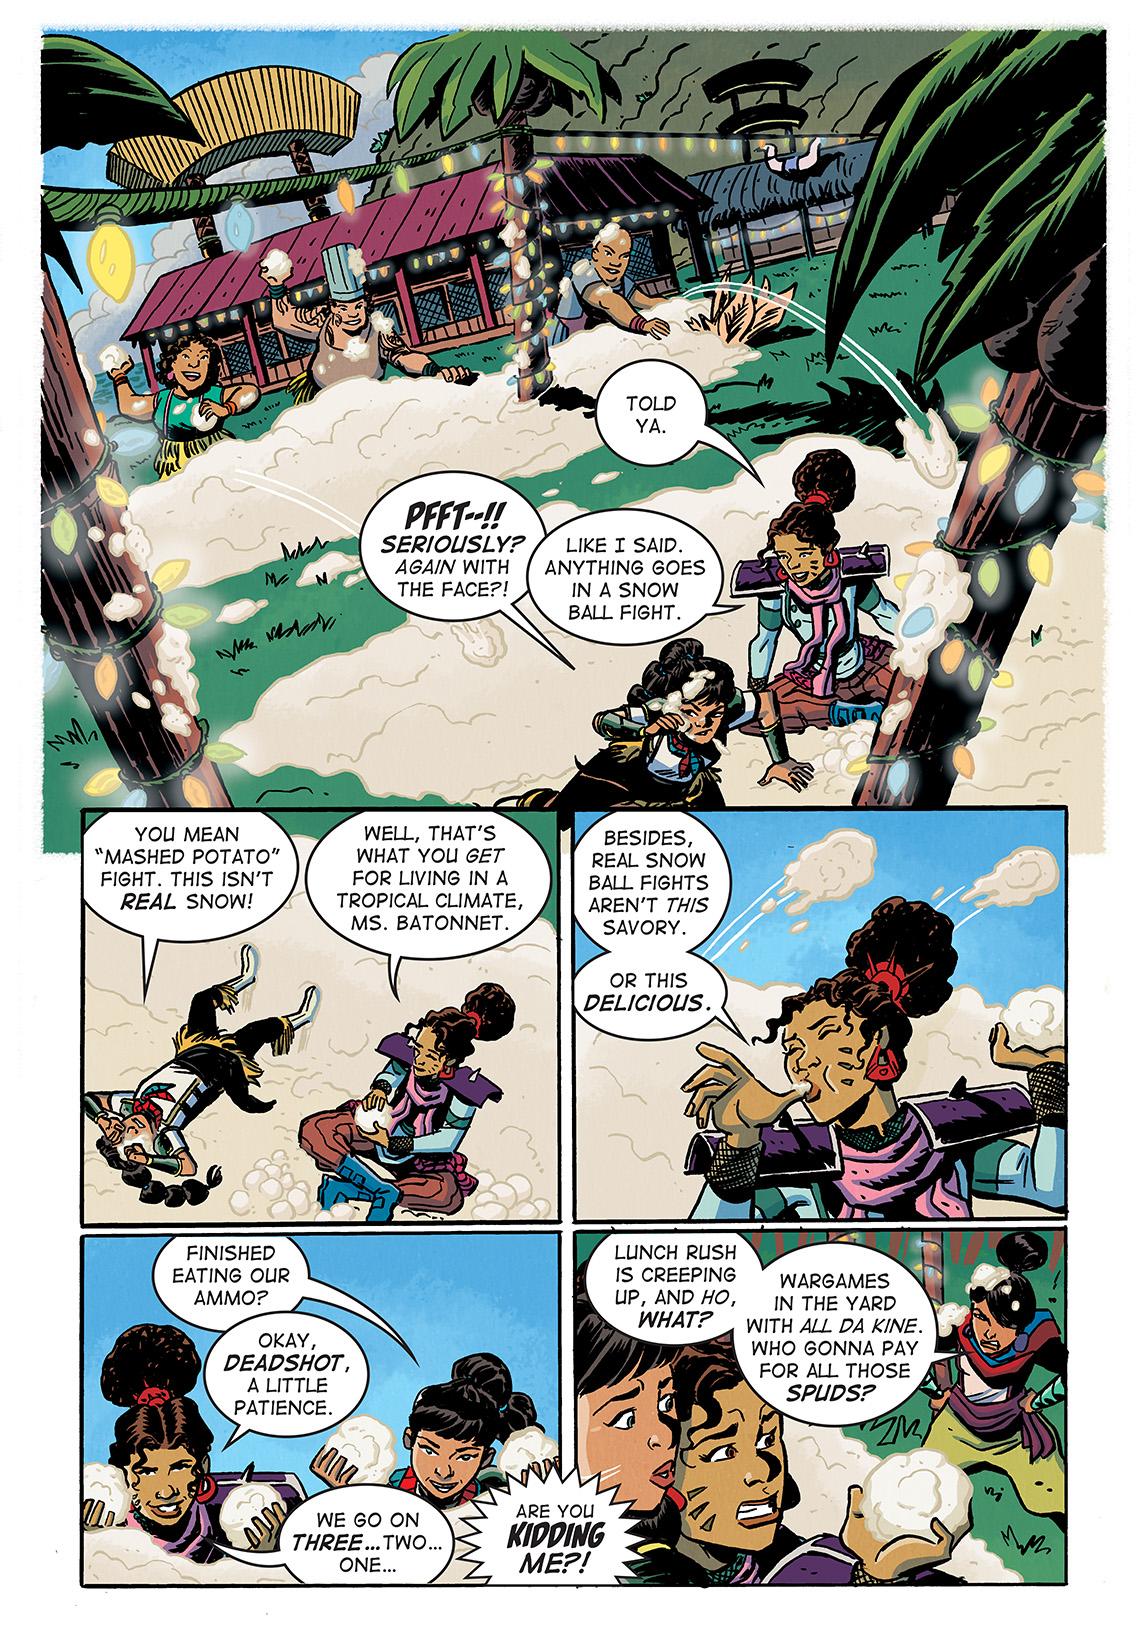 SavorHoliday_Digital_Comic_Color_PG02_Large First Look at Dark Horse Comics' SAVOR TP